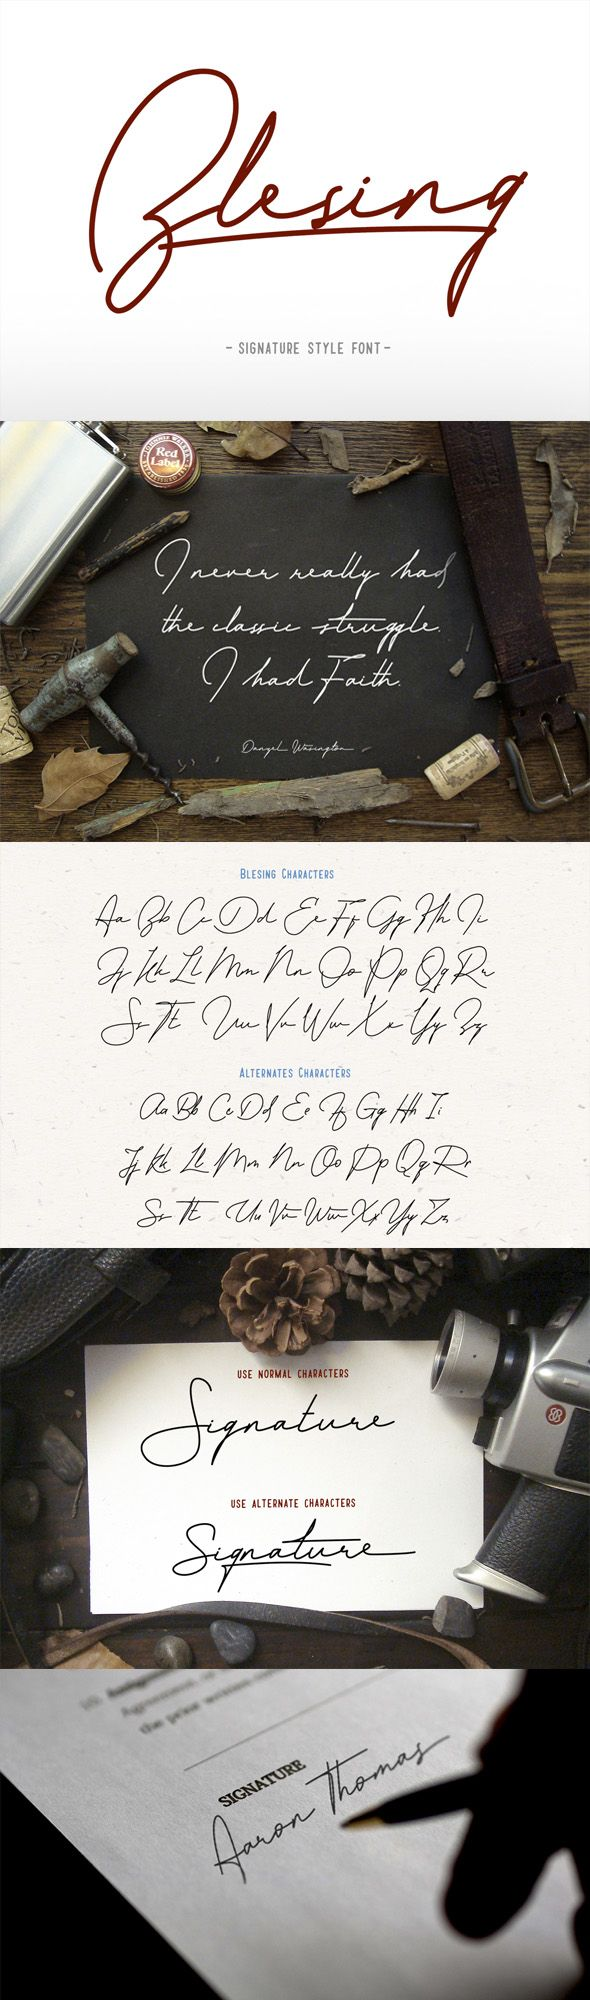 Blesing signature style — OpenType OTF #monoline #poster • Download ➝ https://graphicriver.net/item/blesing-signature-style/19408904?ref=pxcr